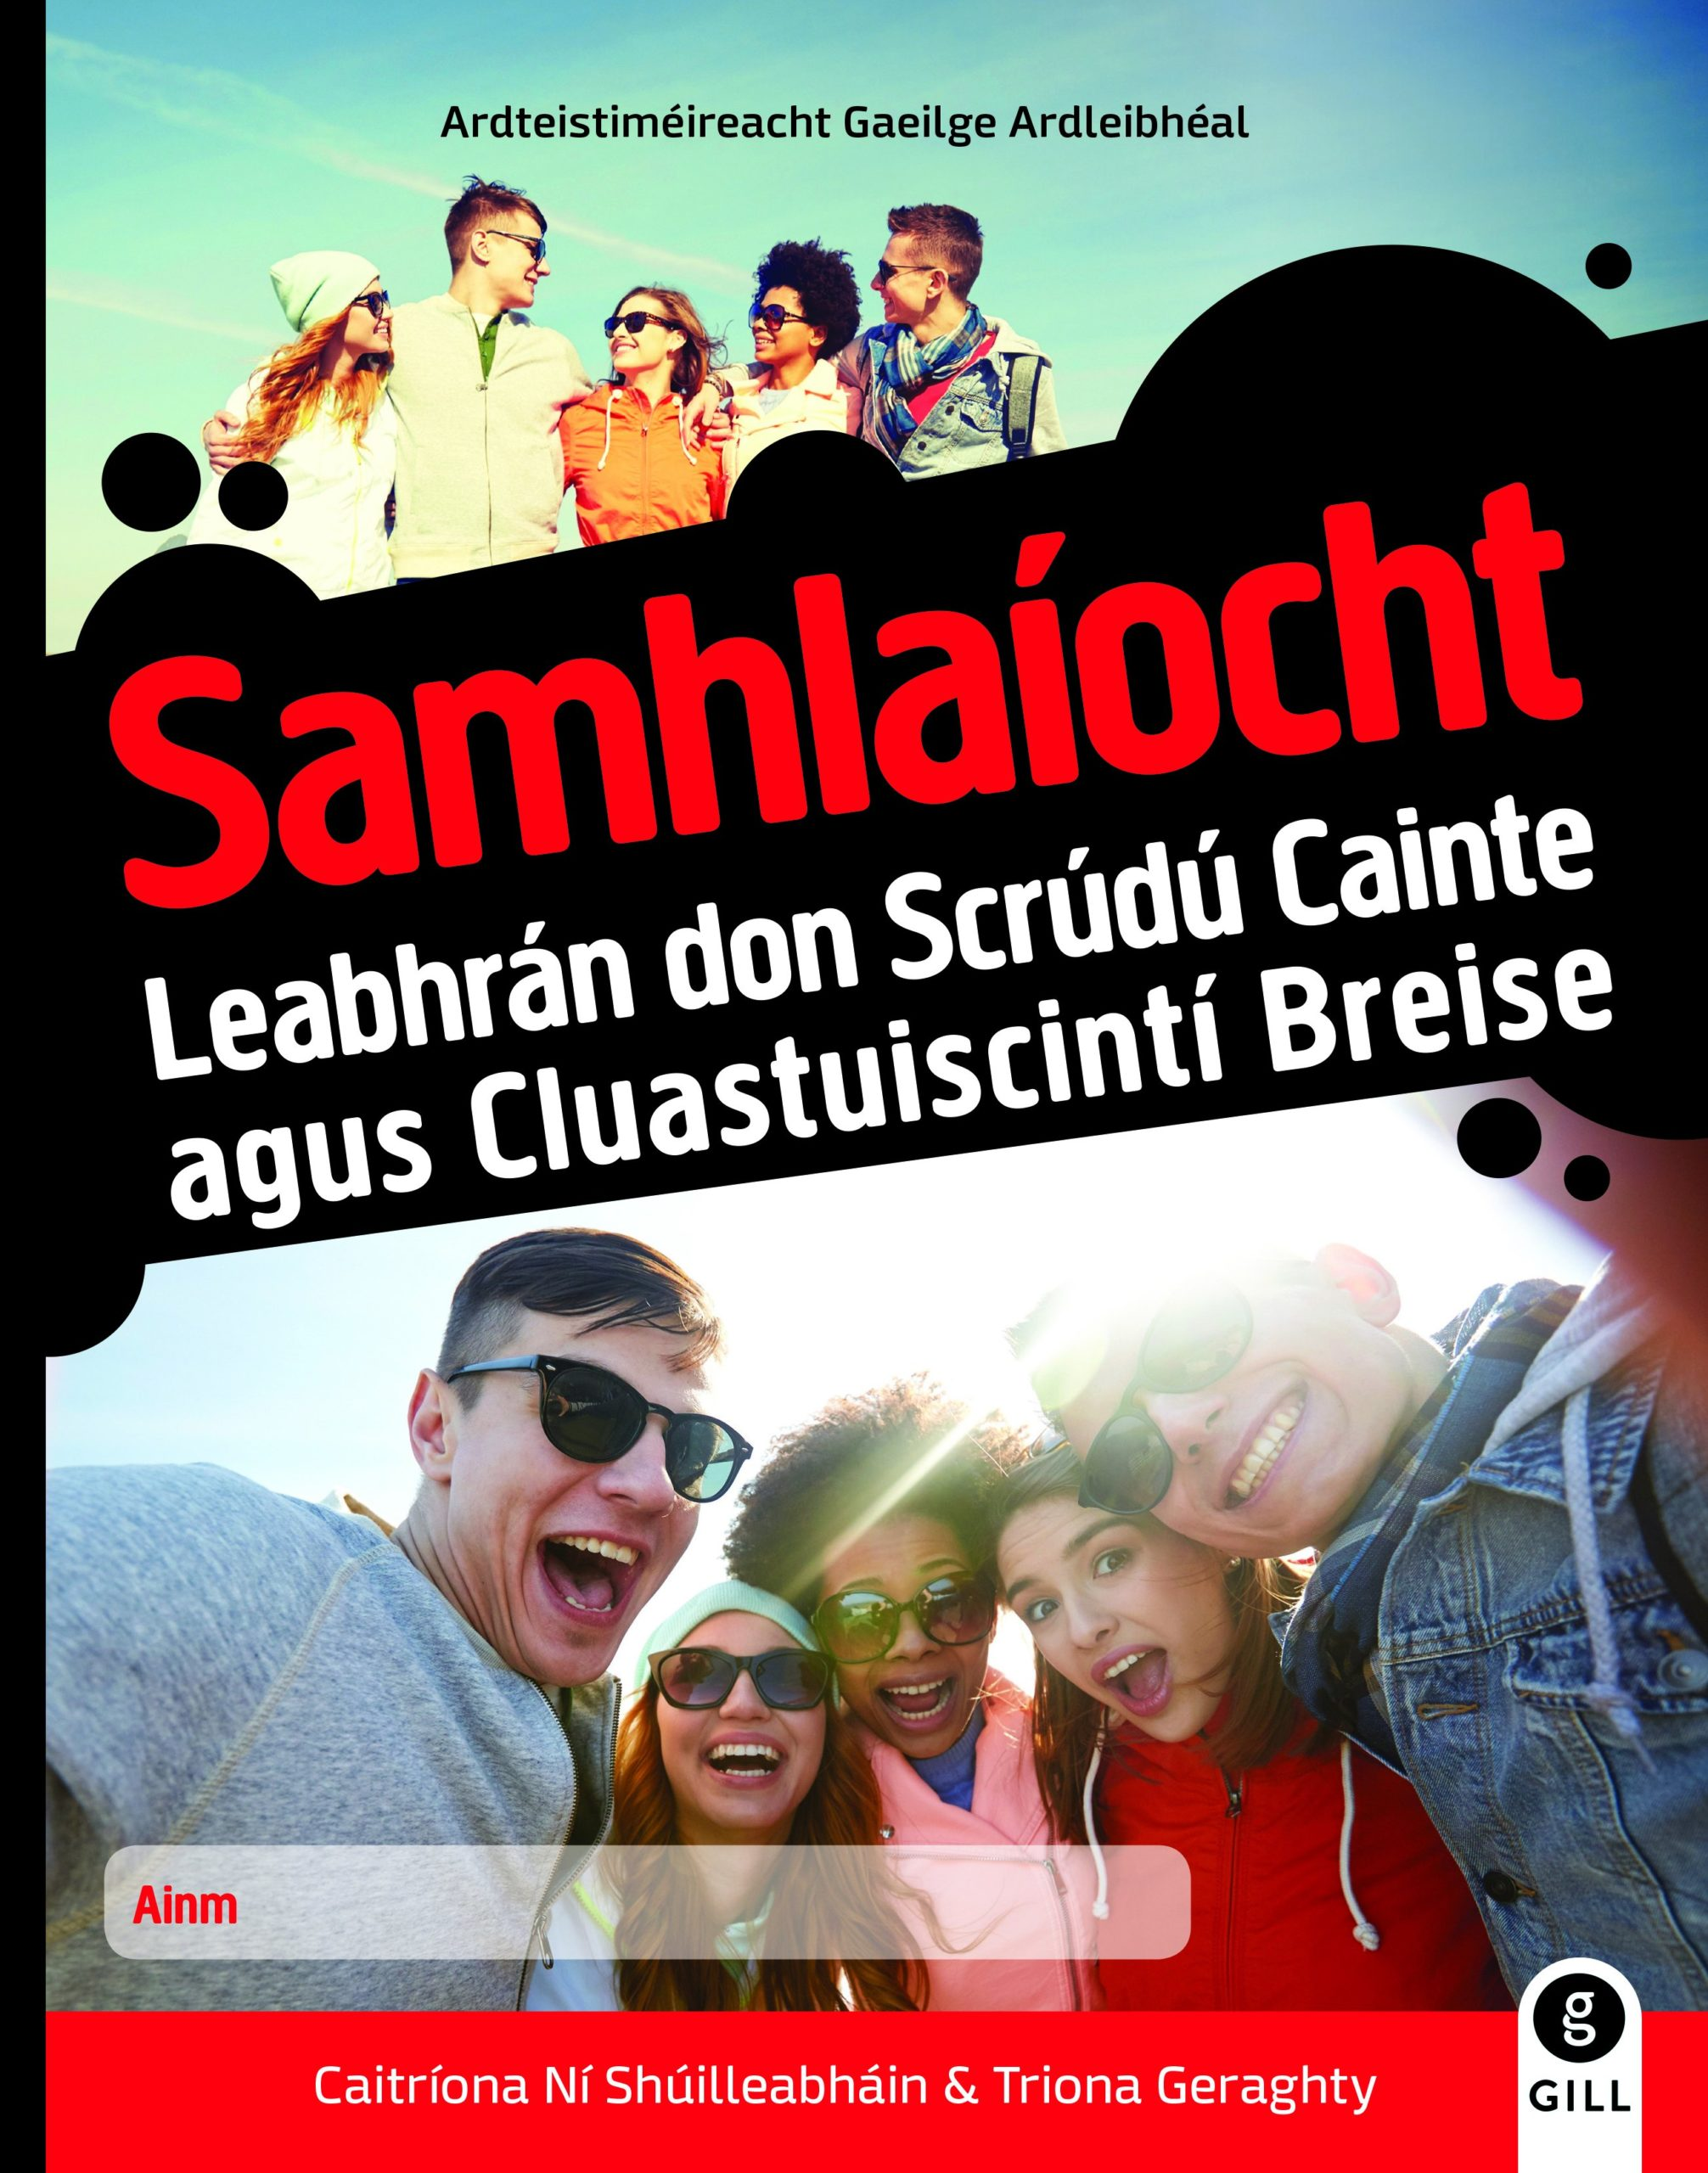 Samhlaiocht Workbook Only